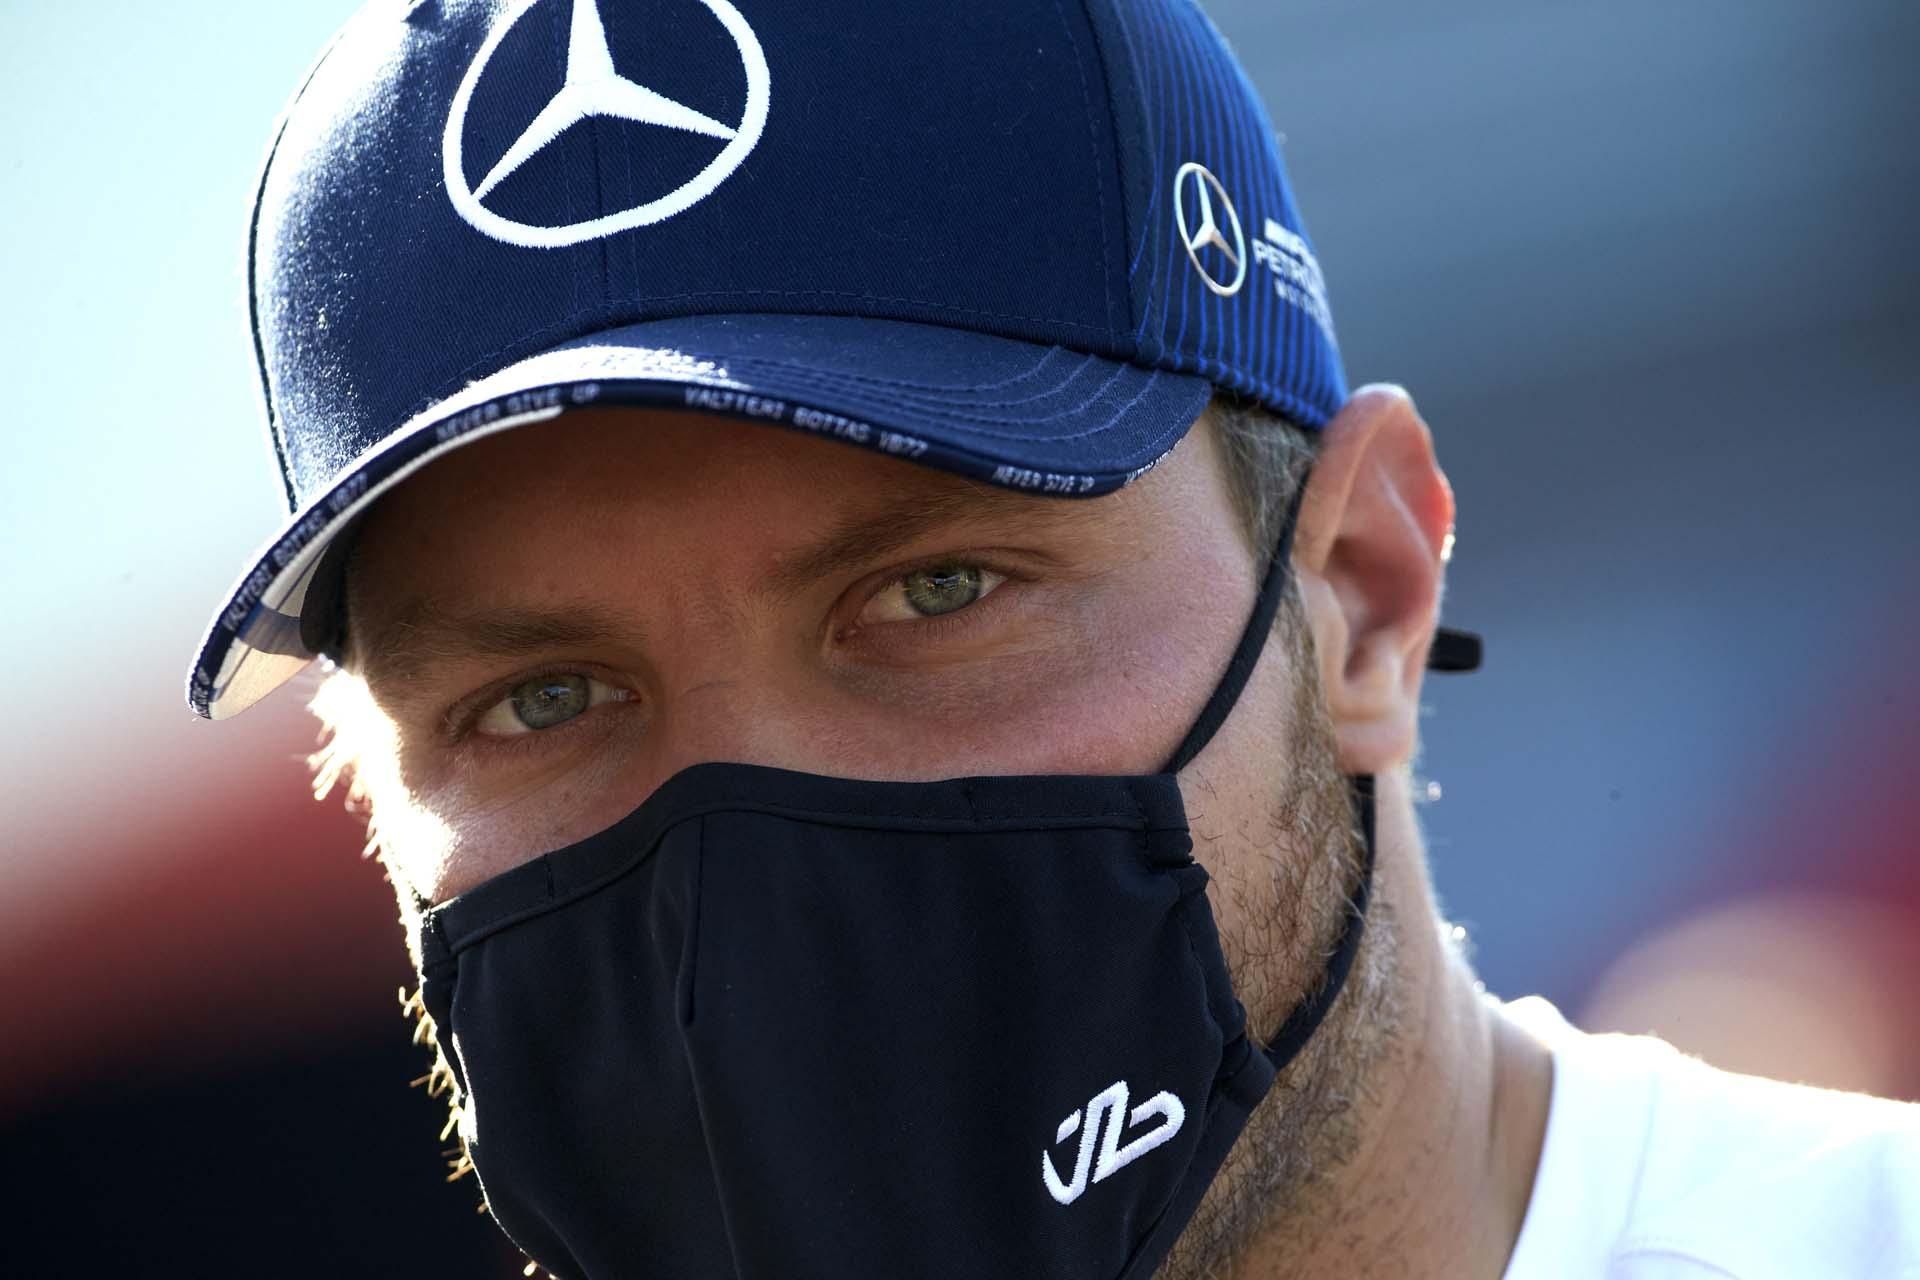 2020 Italian Grand Prix, Thursday - Steve Etherington